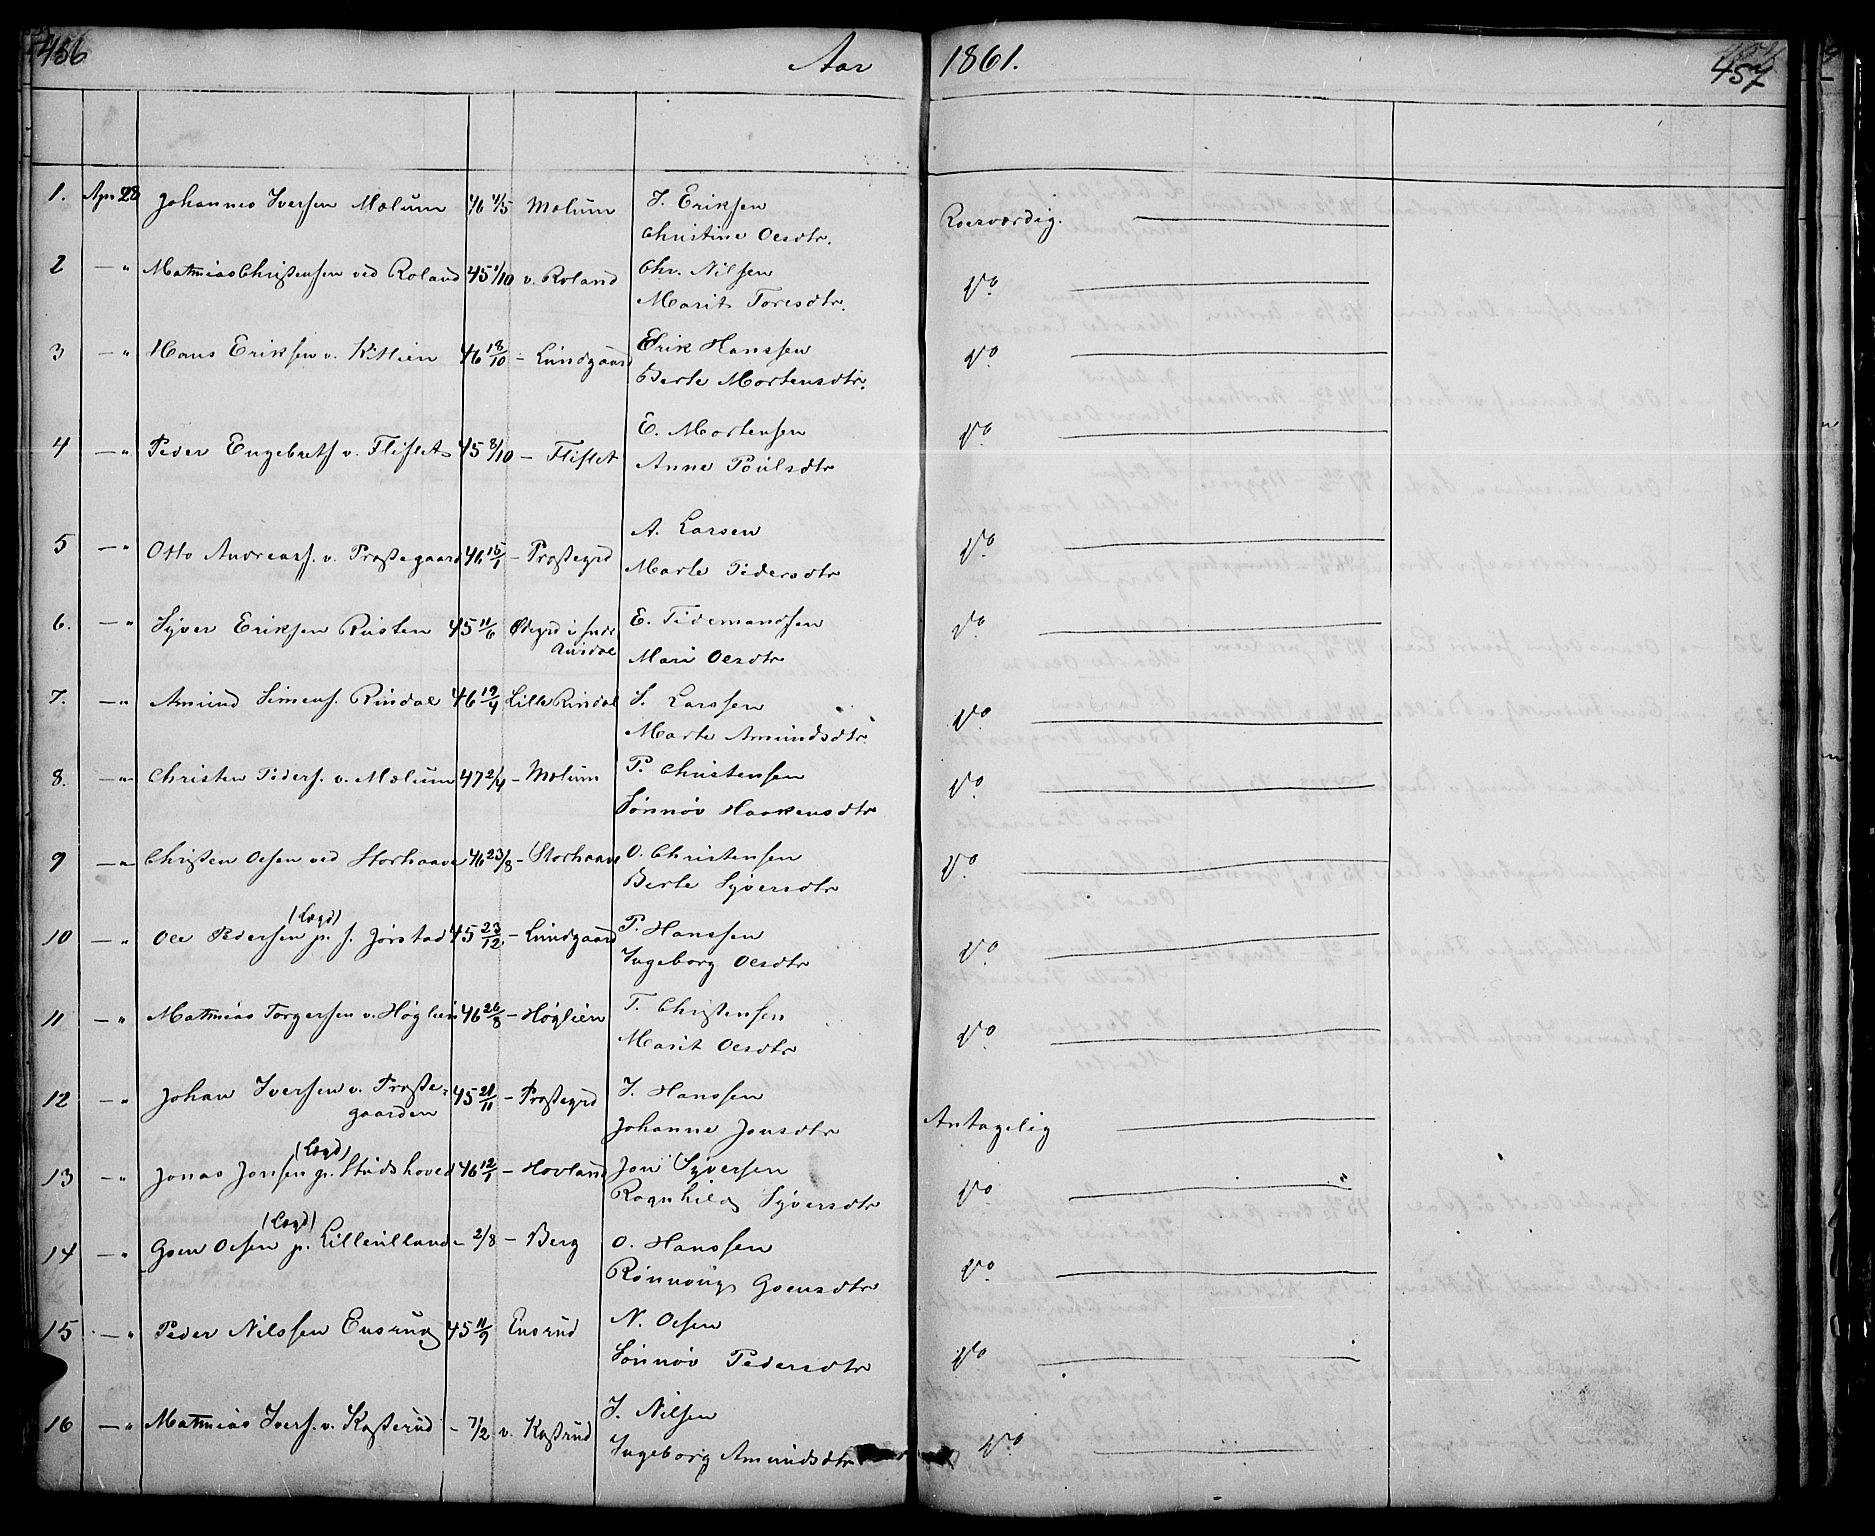 SAH, Fåberg prestekontor, Klokkerbok nr. 5, 1837-1864, s. 456-457